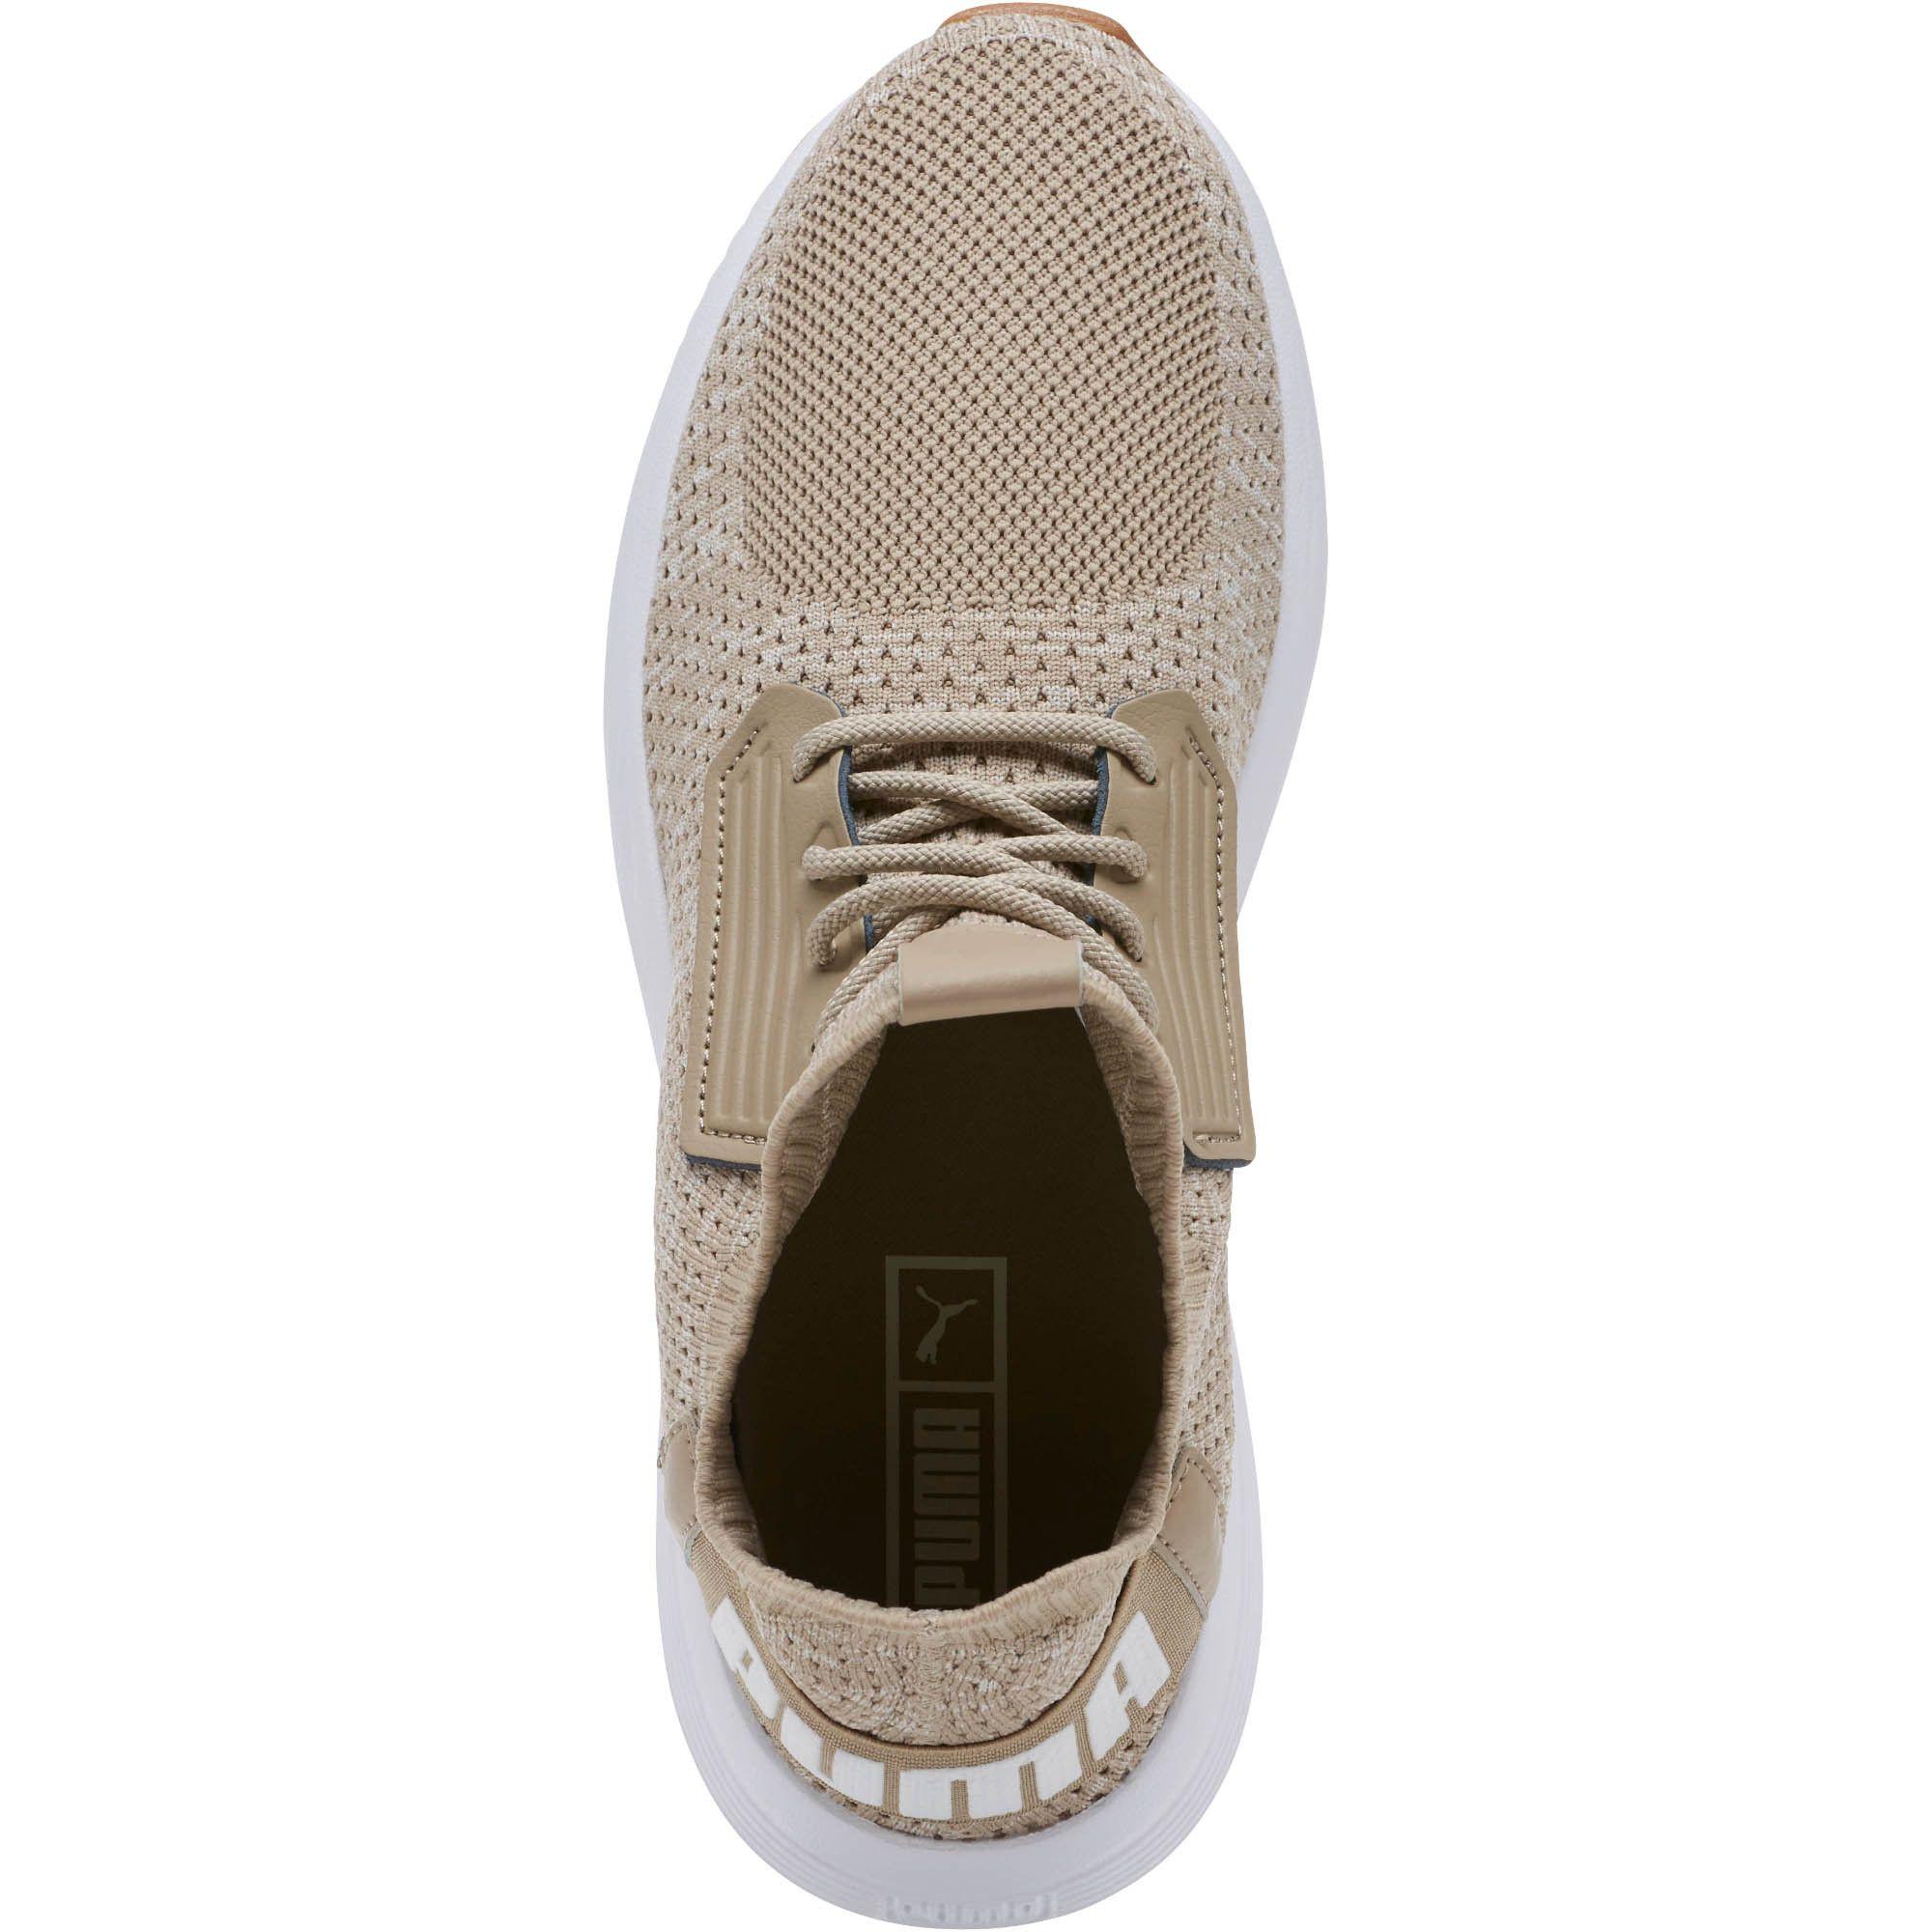 f2e57a86f0442b PUMA Uprise Knit Men s Sneakers Men Shoe Evolution New  40.0 End Date   2019-02